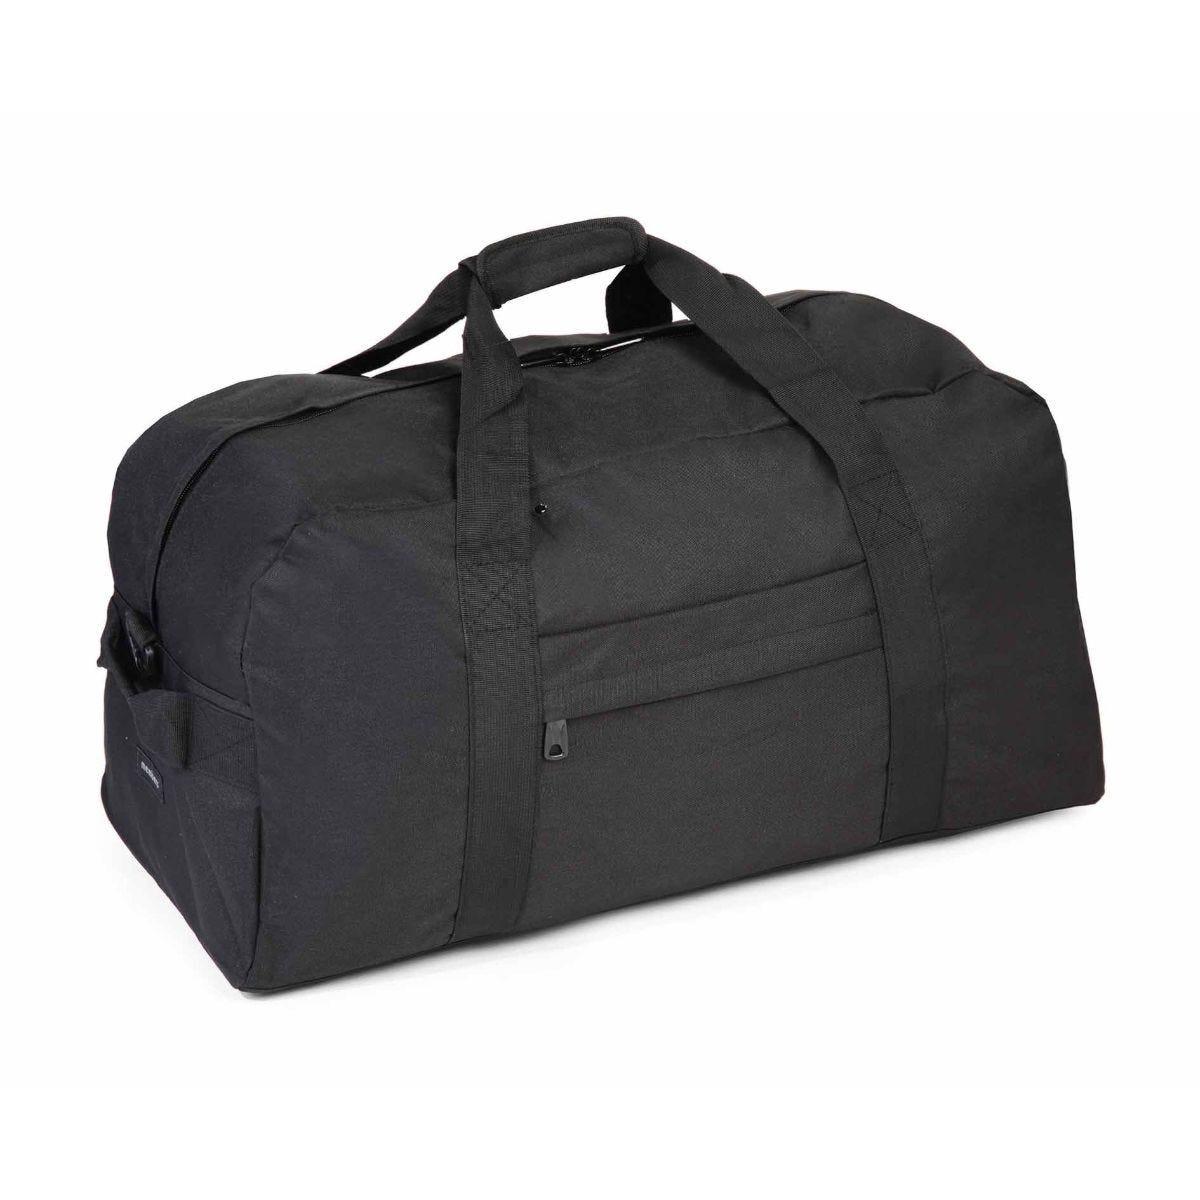 Members by Rock Medium Holdall and Duffle Bag 65cm Black